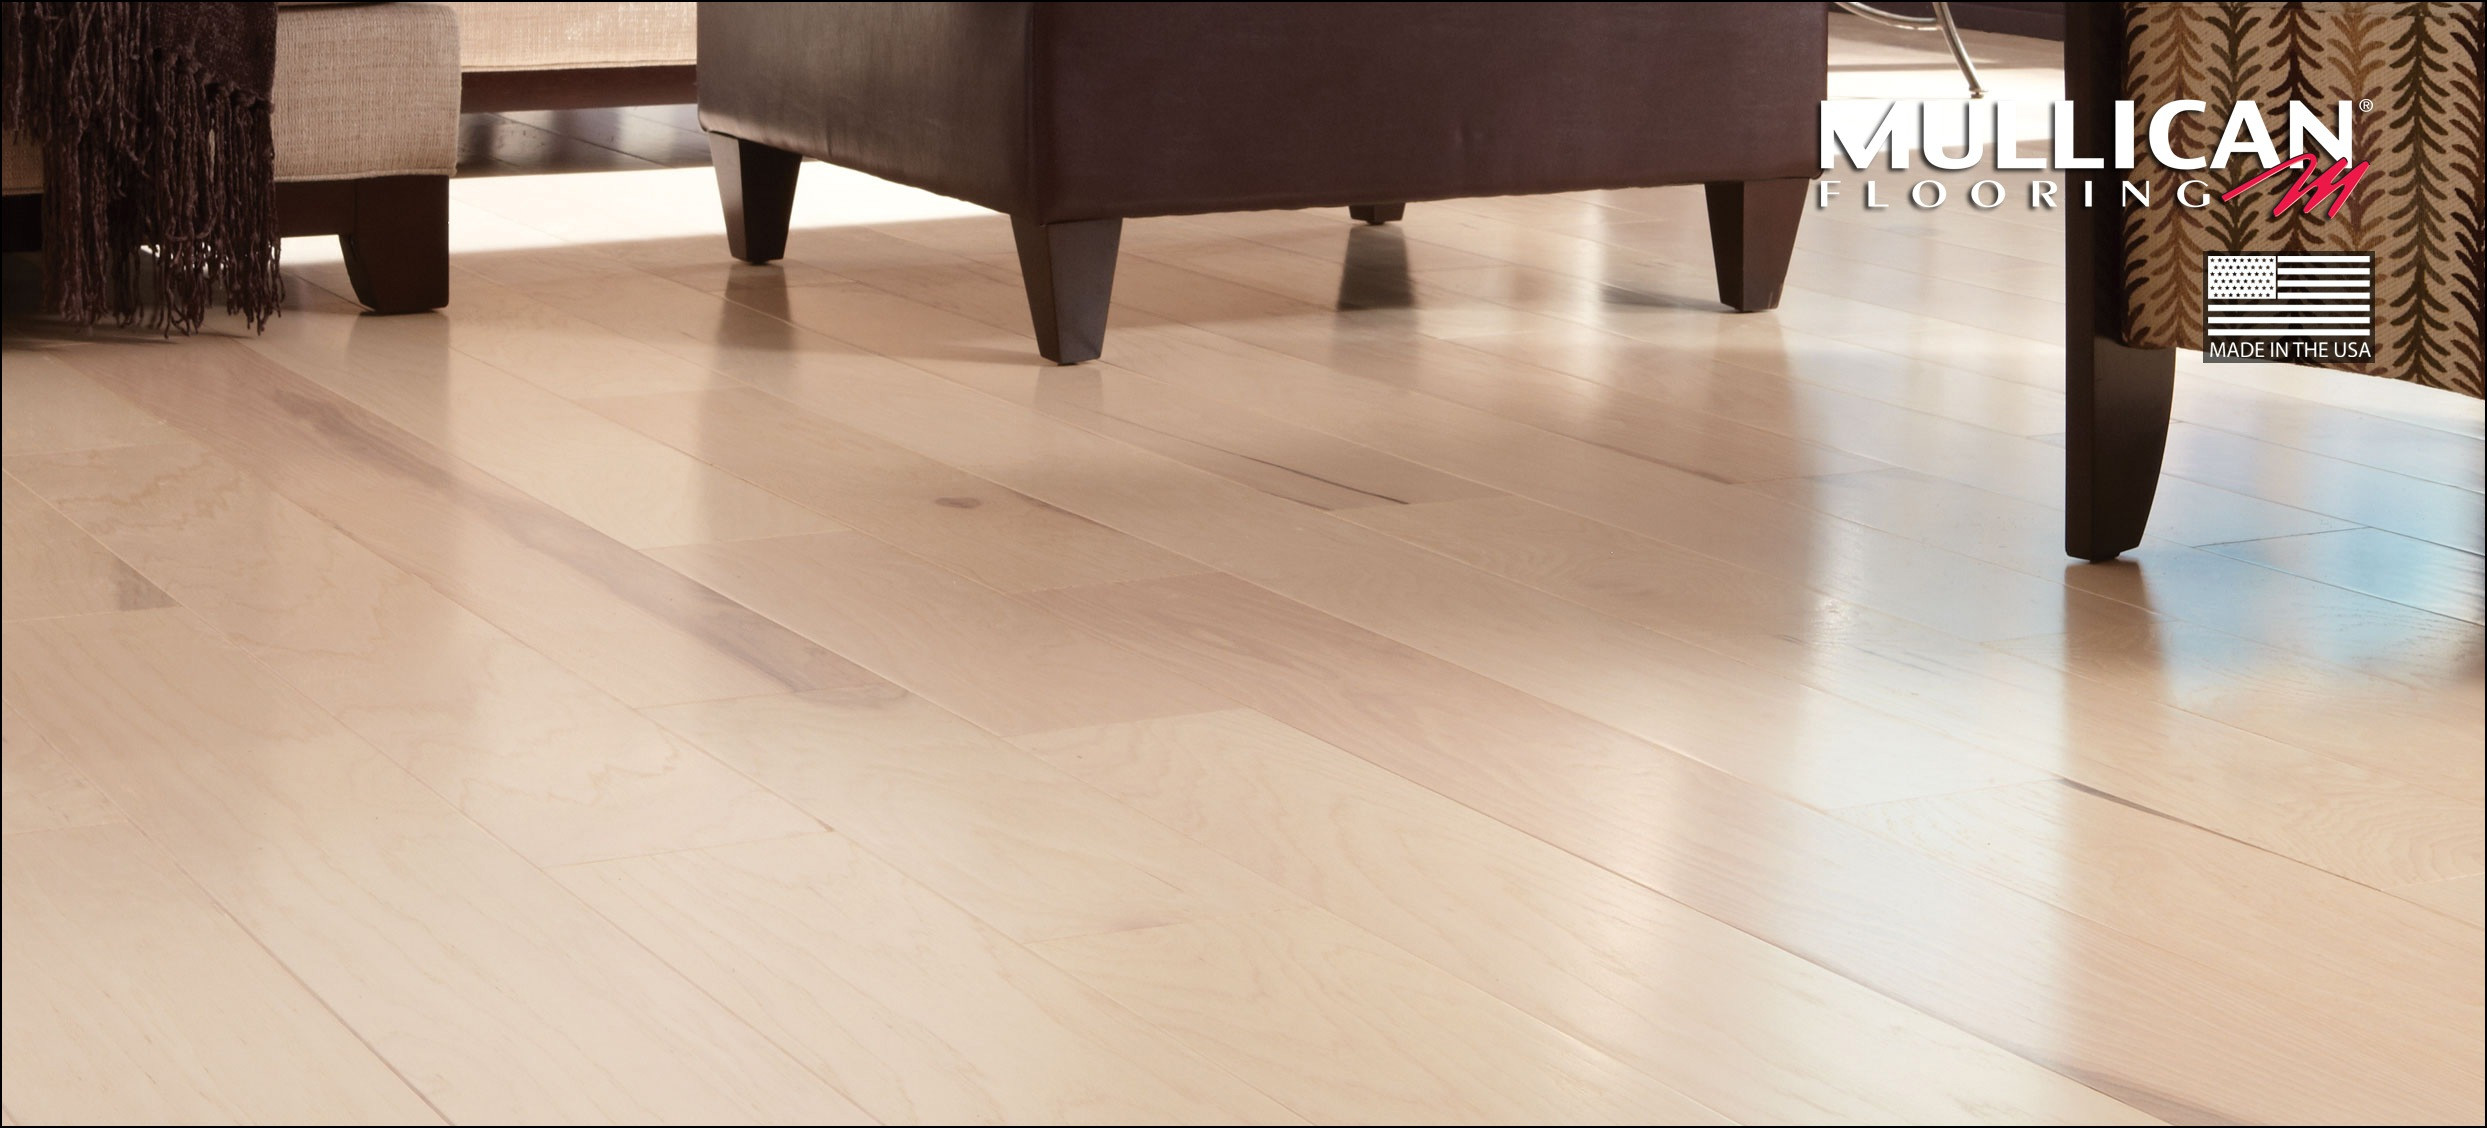 29 Recommended Hardwood Floor Refinishing Atlanta Unique